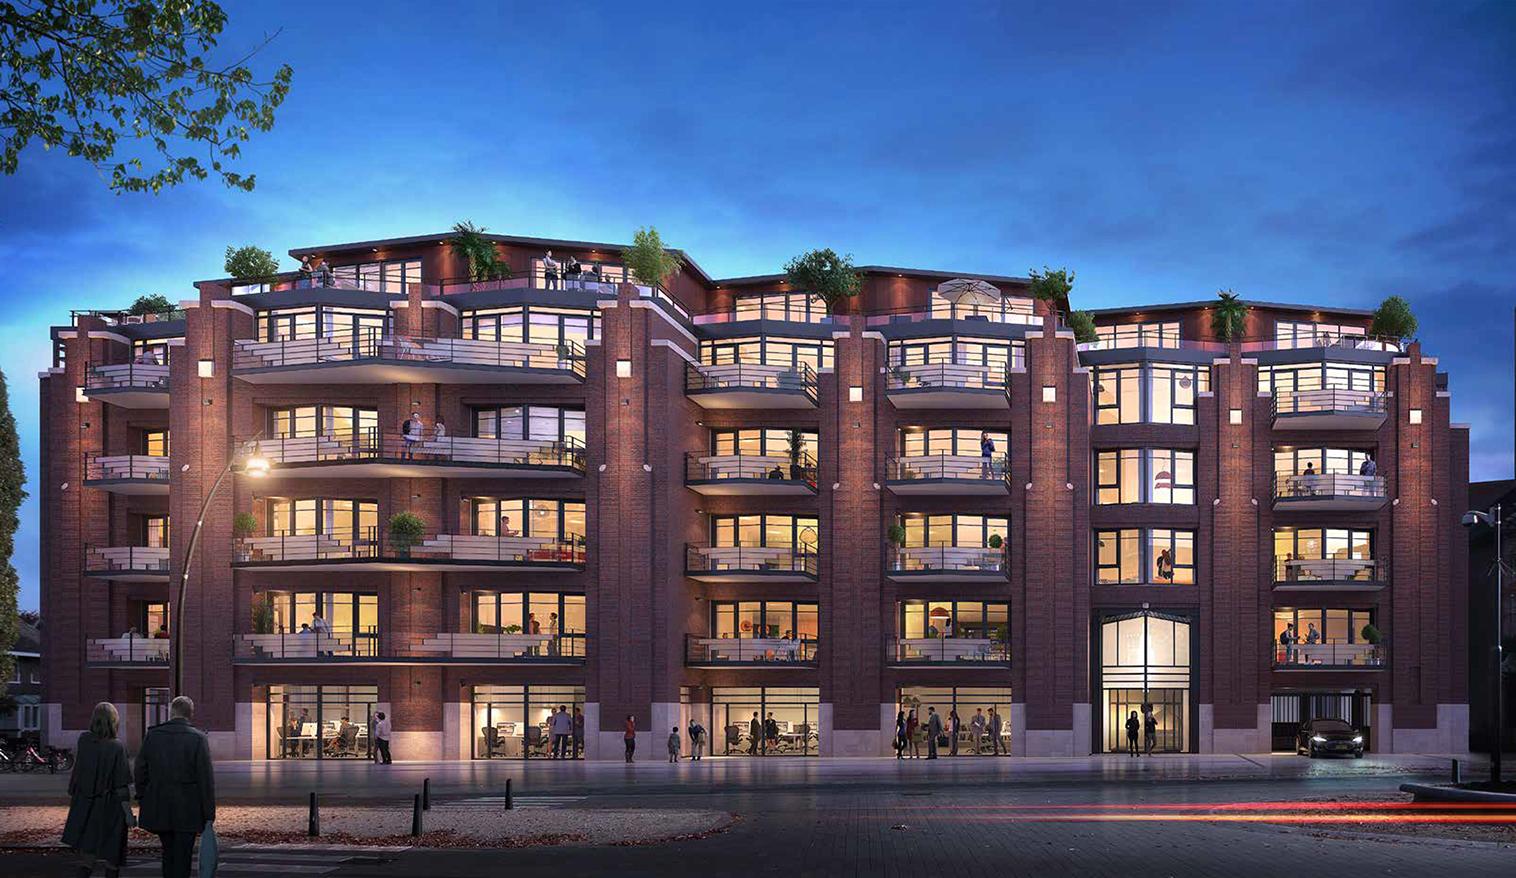 00 OPL Architecten_WalkartHouse Zeist header 1516×878-72dpi